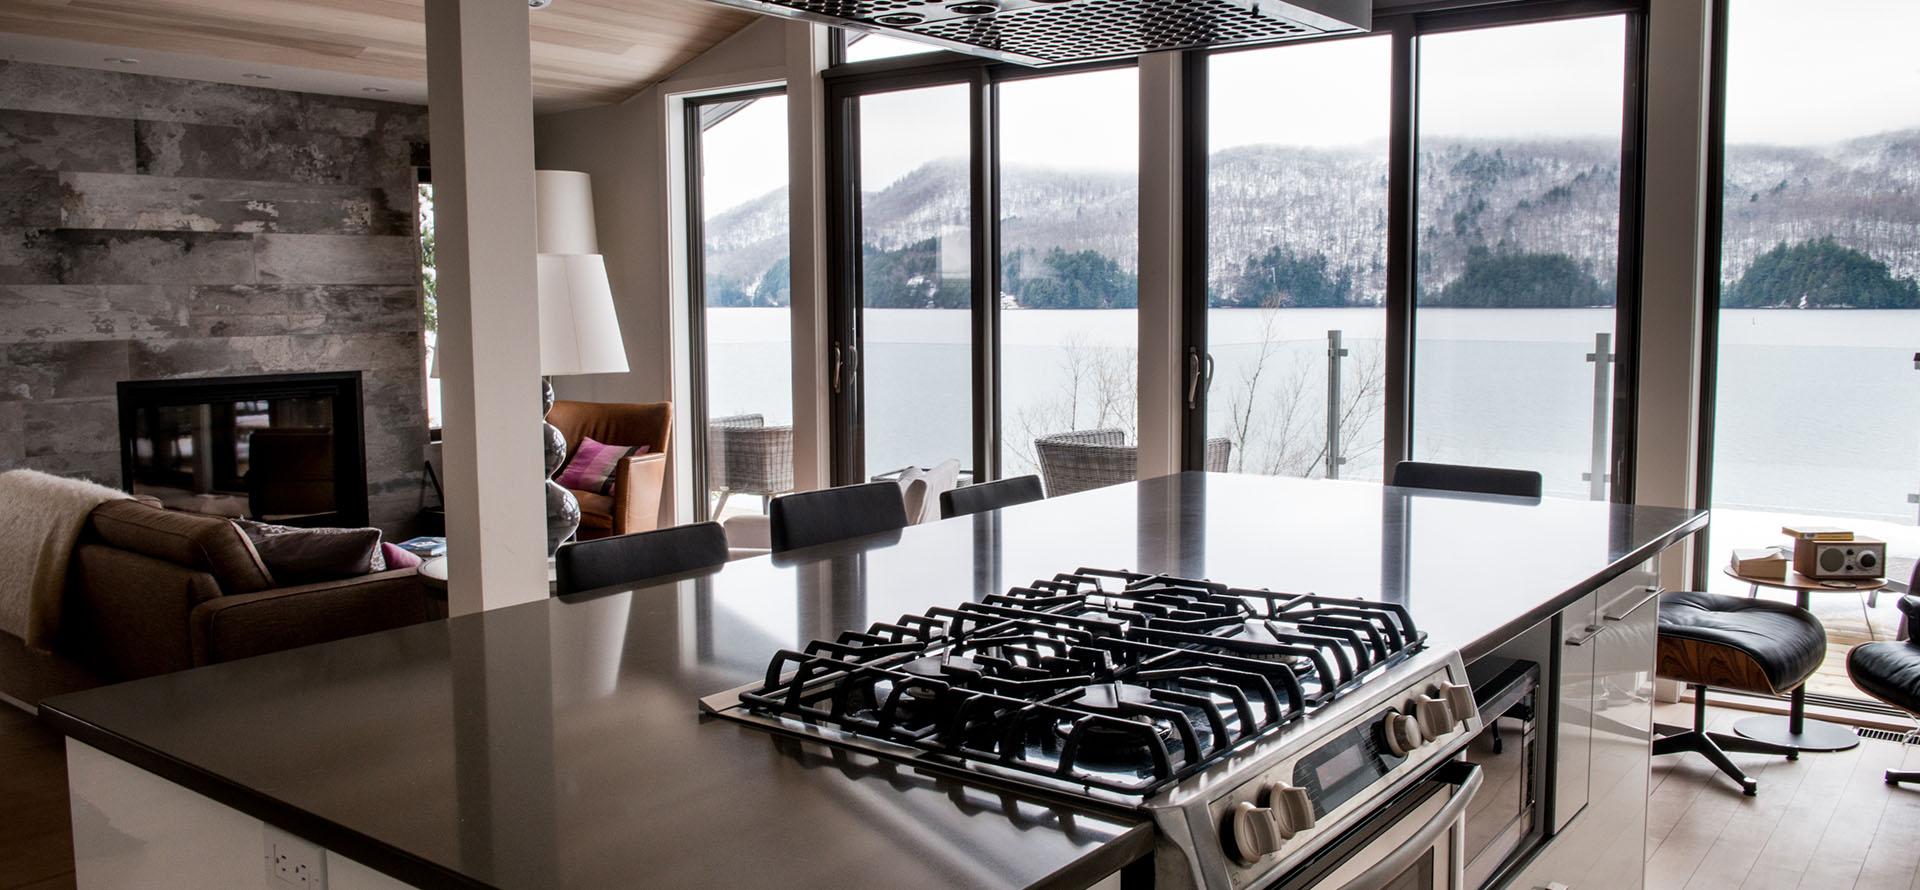 Cuisine Moderne Sherbrooke (Roubaix 21)  Design